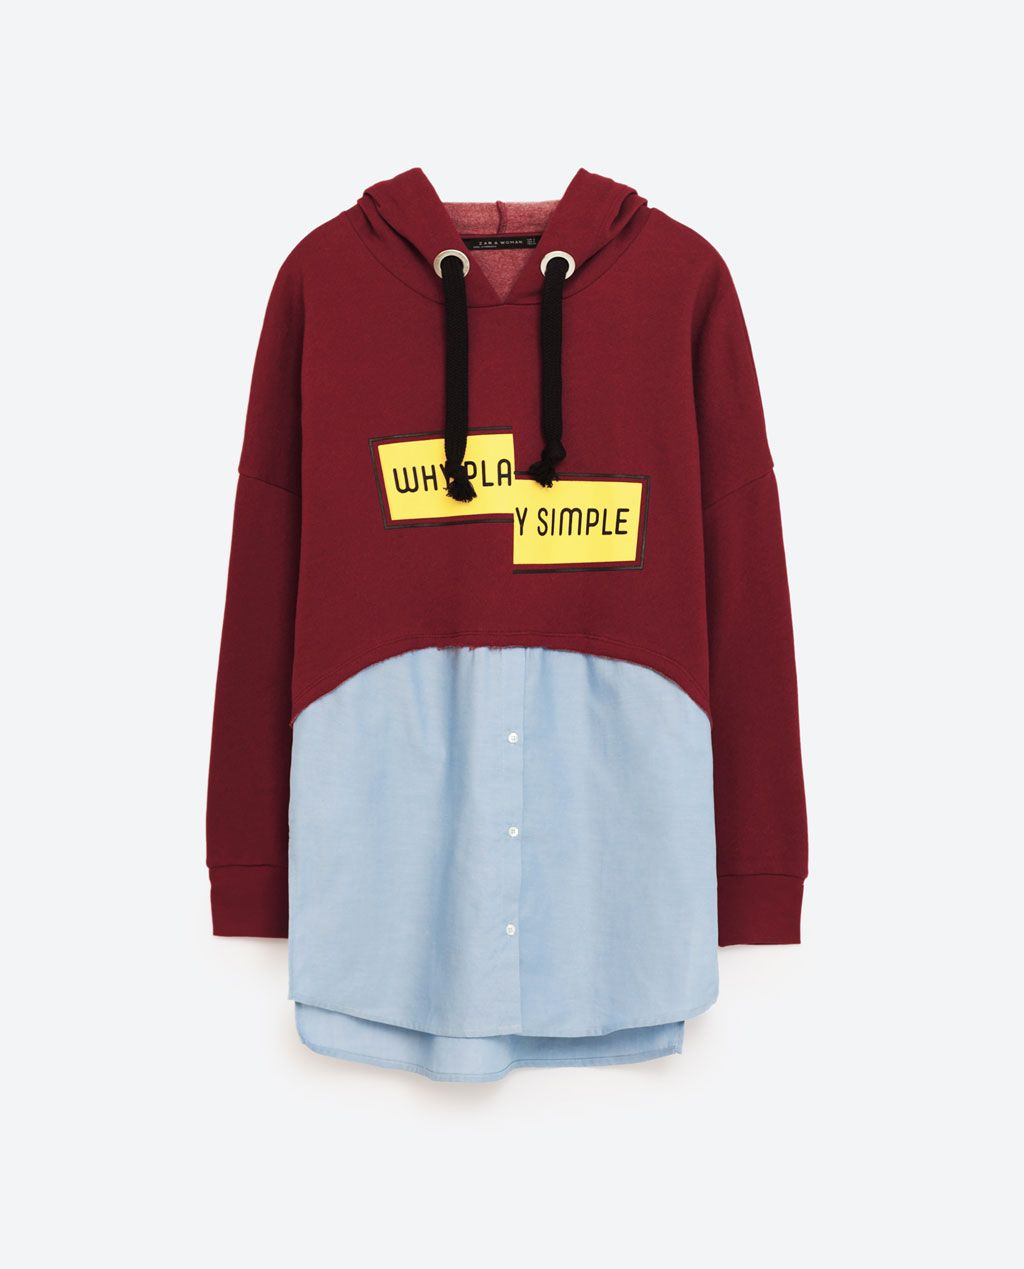 c286cb5d Why Play Simple CONTRAST SWEATSHIRT from Zara | Fashion Sense ...